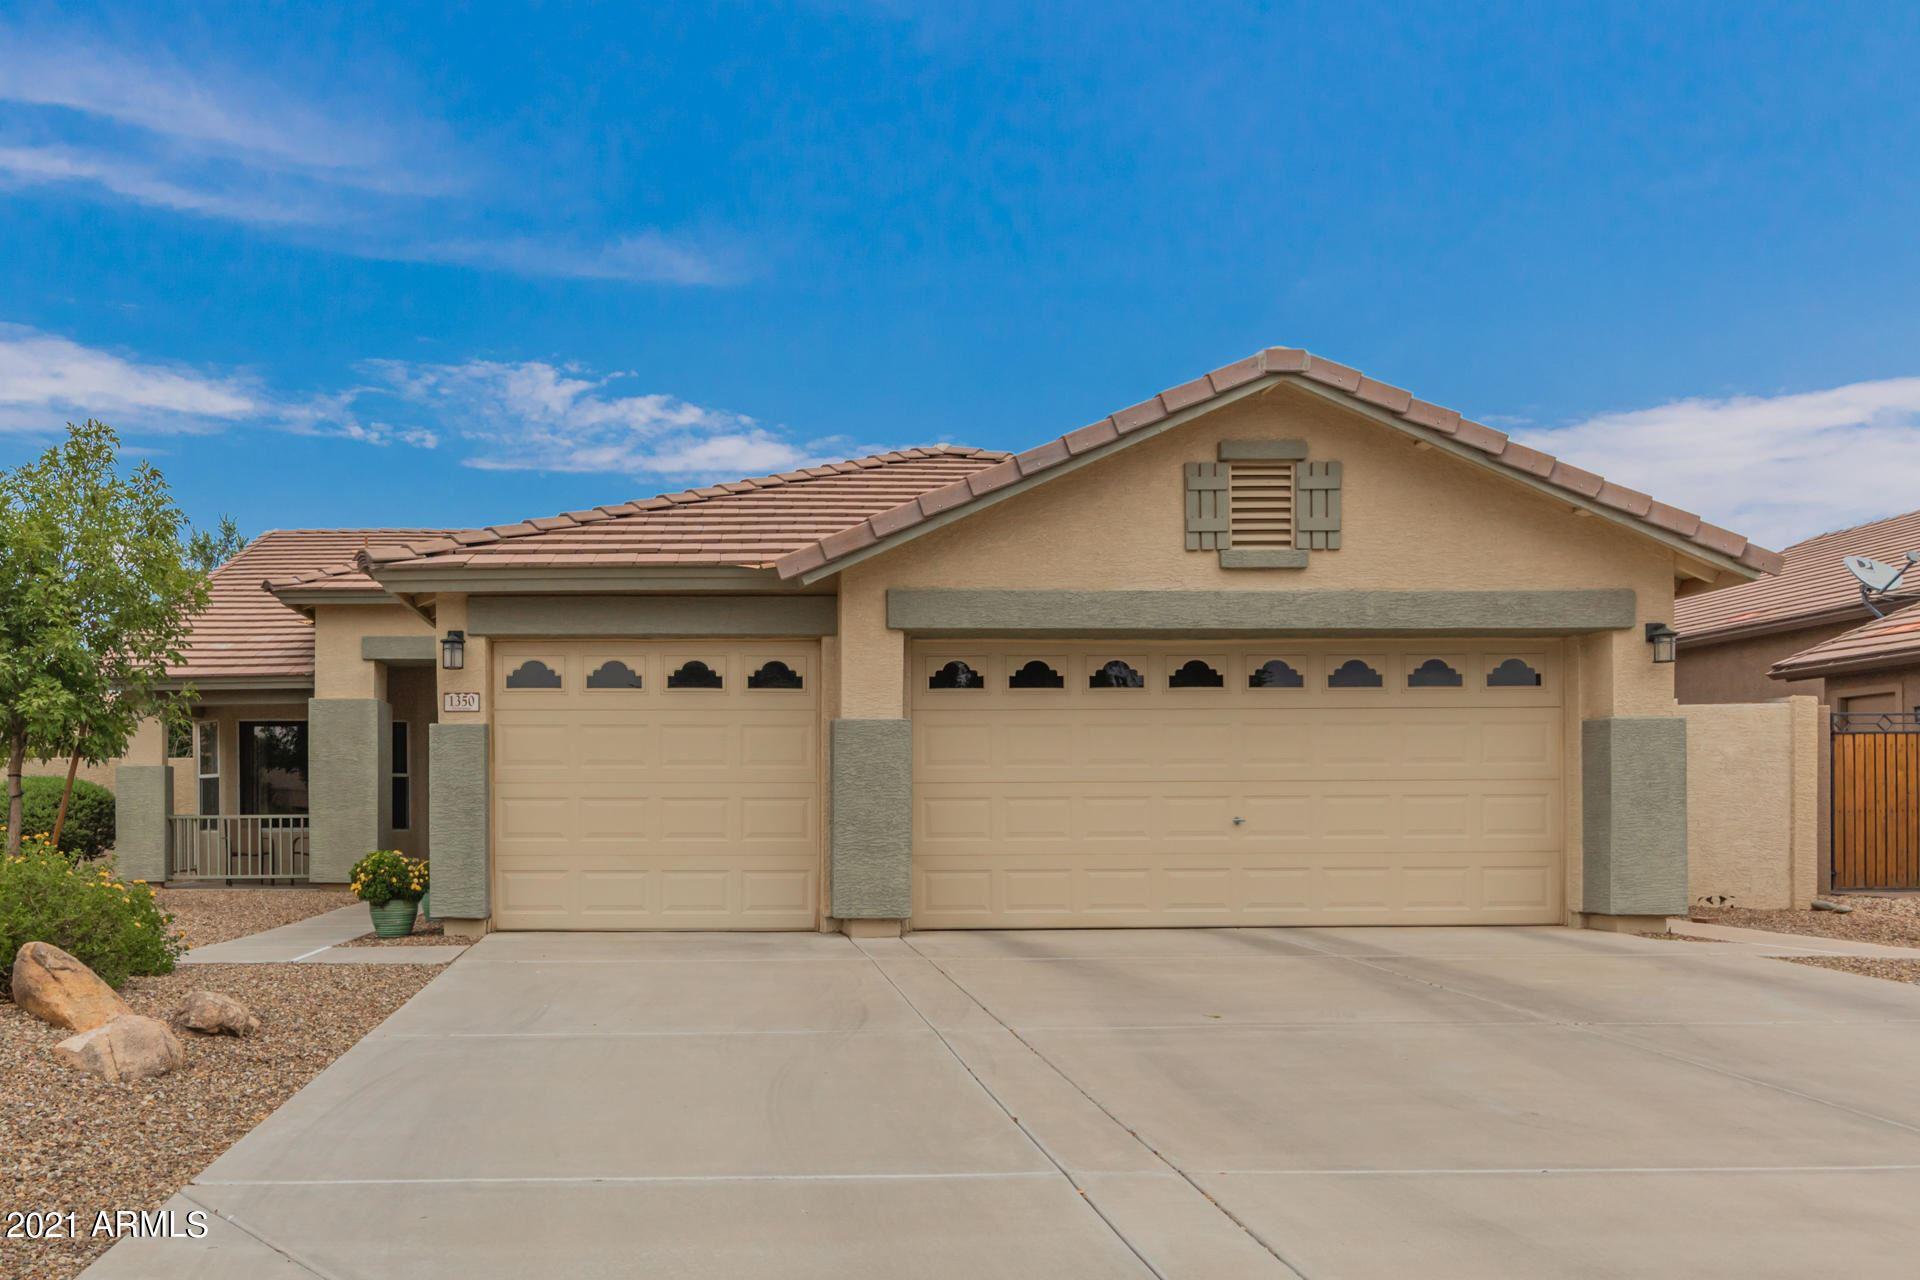 Photo of 1350 E Carla Vista Drive, Gilbert, AZ 85295 (MLS # 6269199)